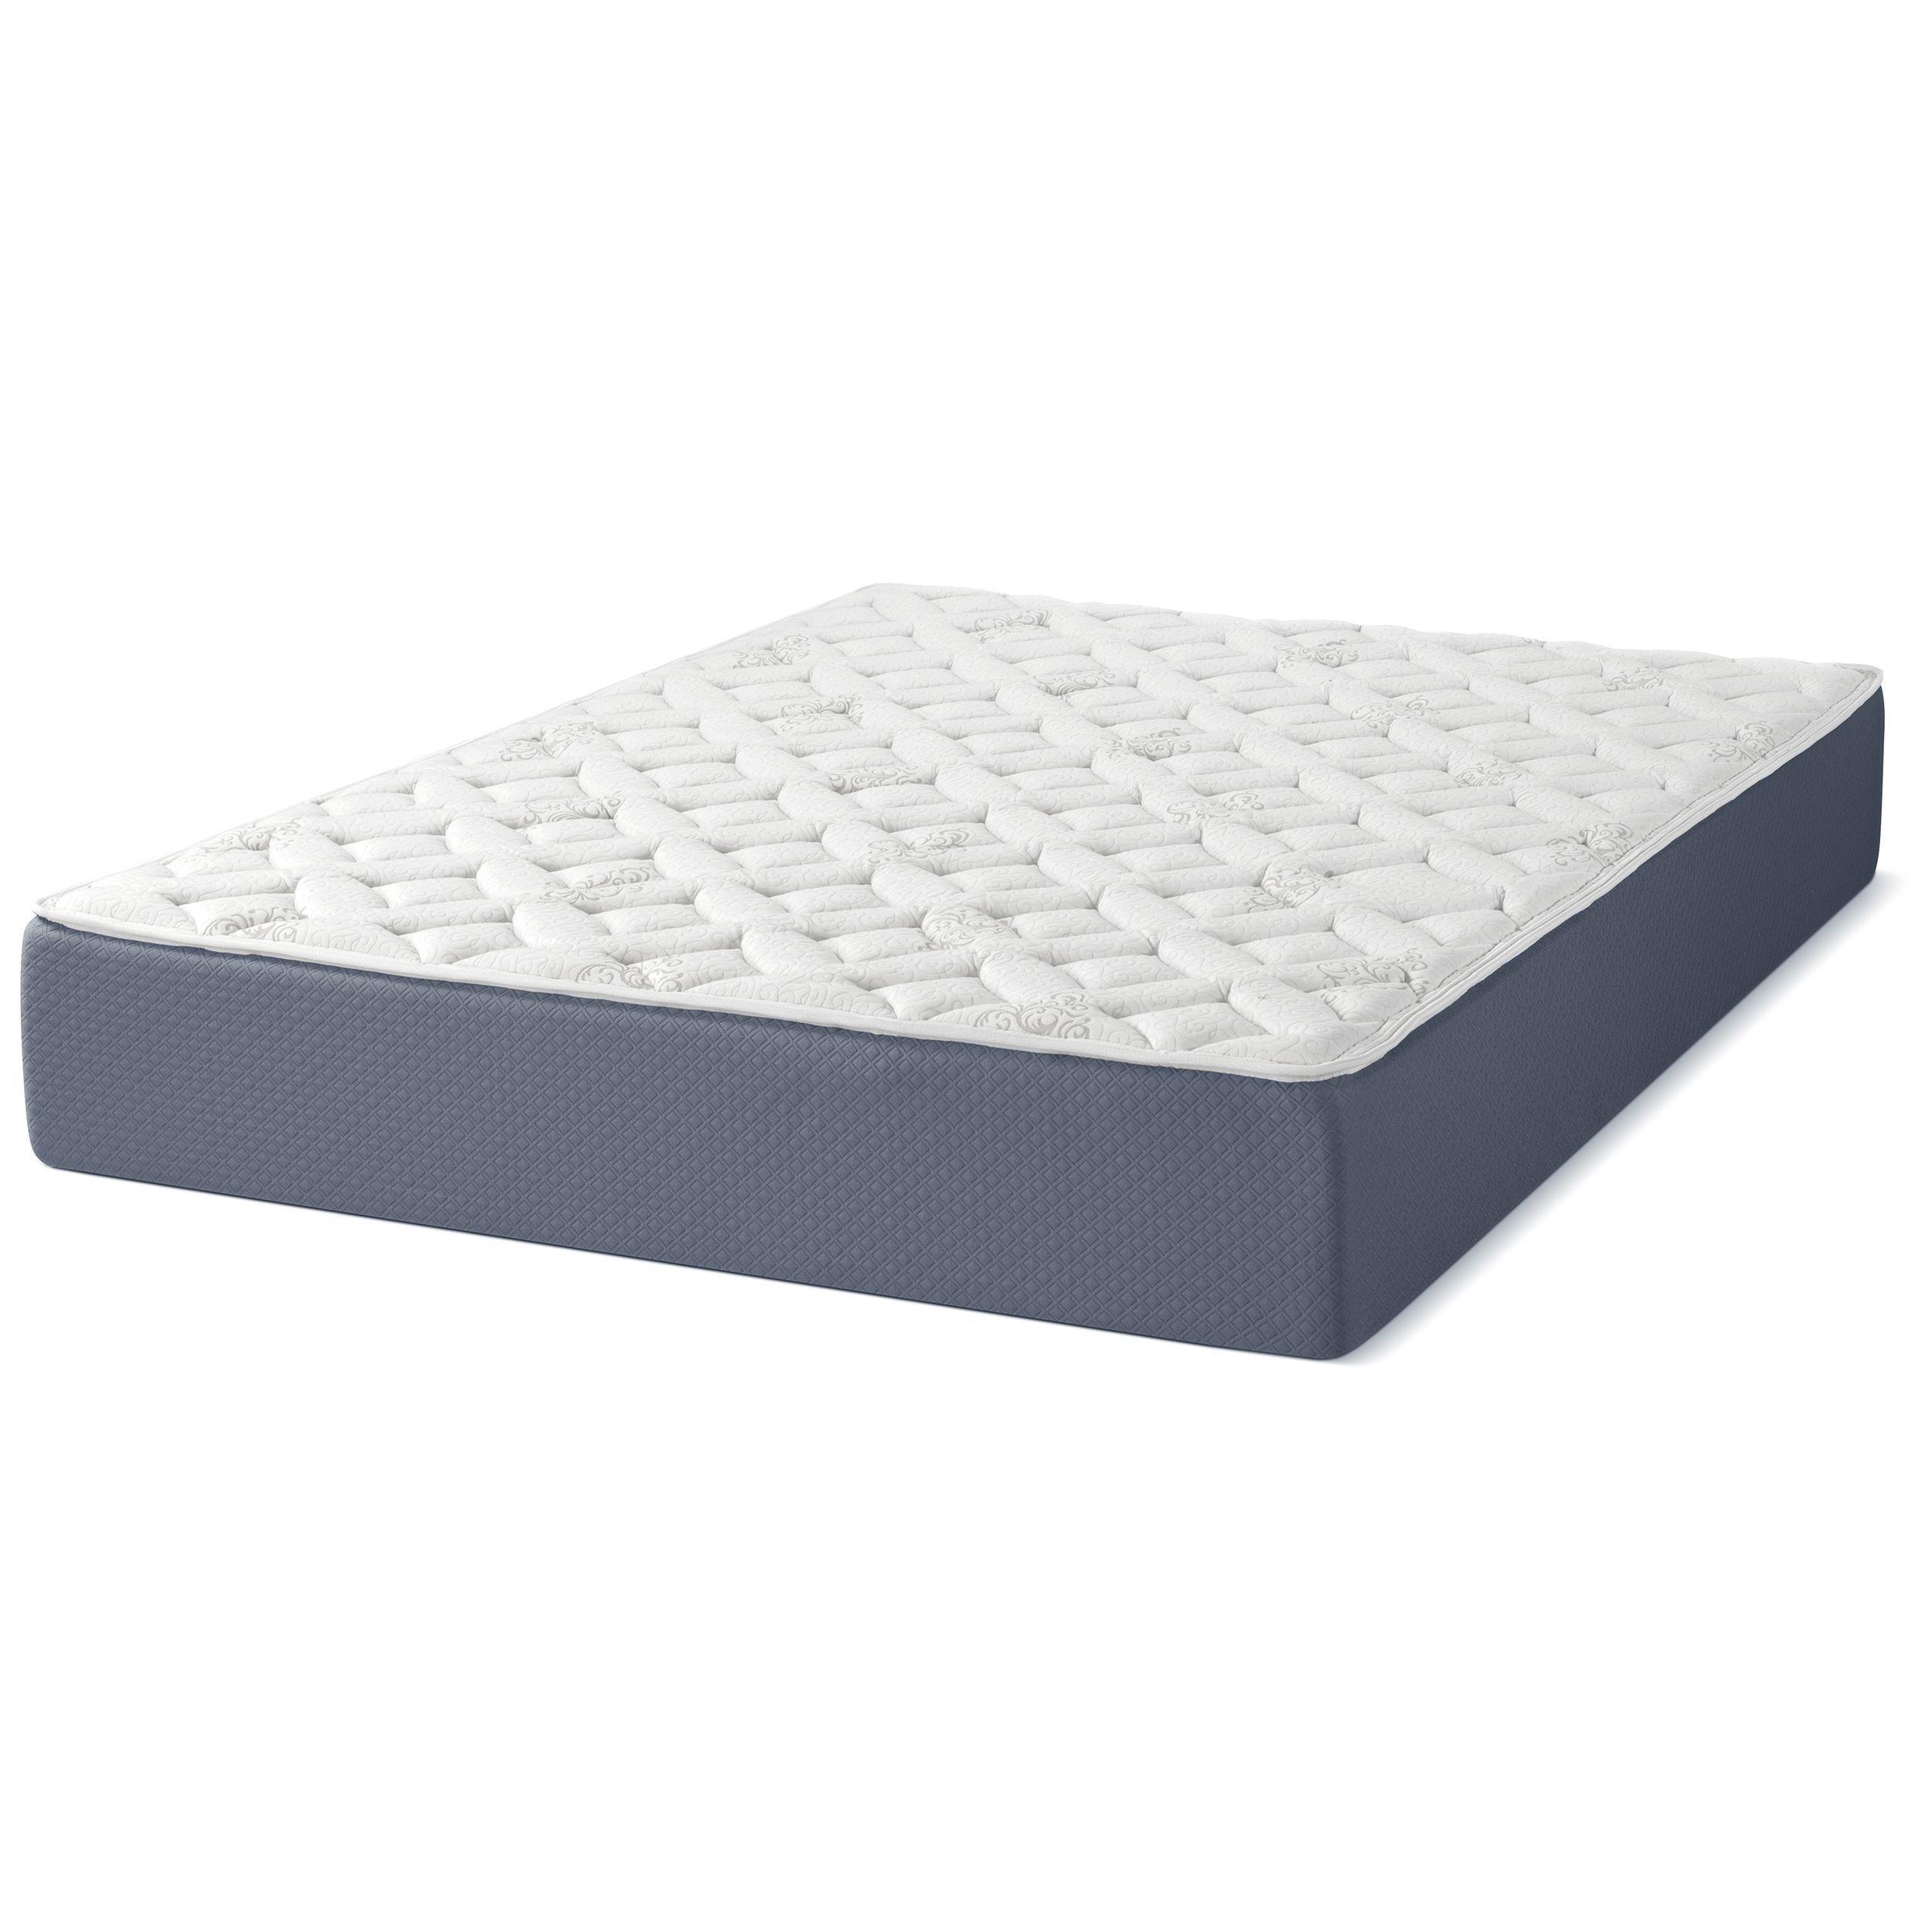 Select Luxury 12-inch Twin-size Quilted Airflow Gel Memory Foam Mattress (Twin), Black night